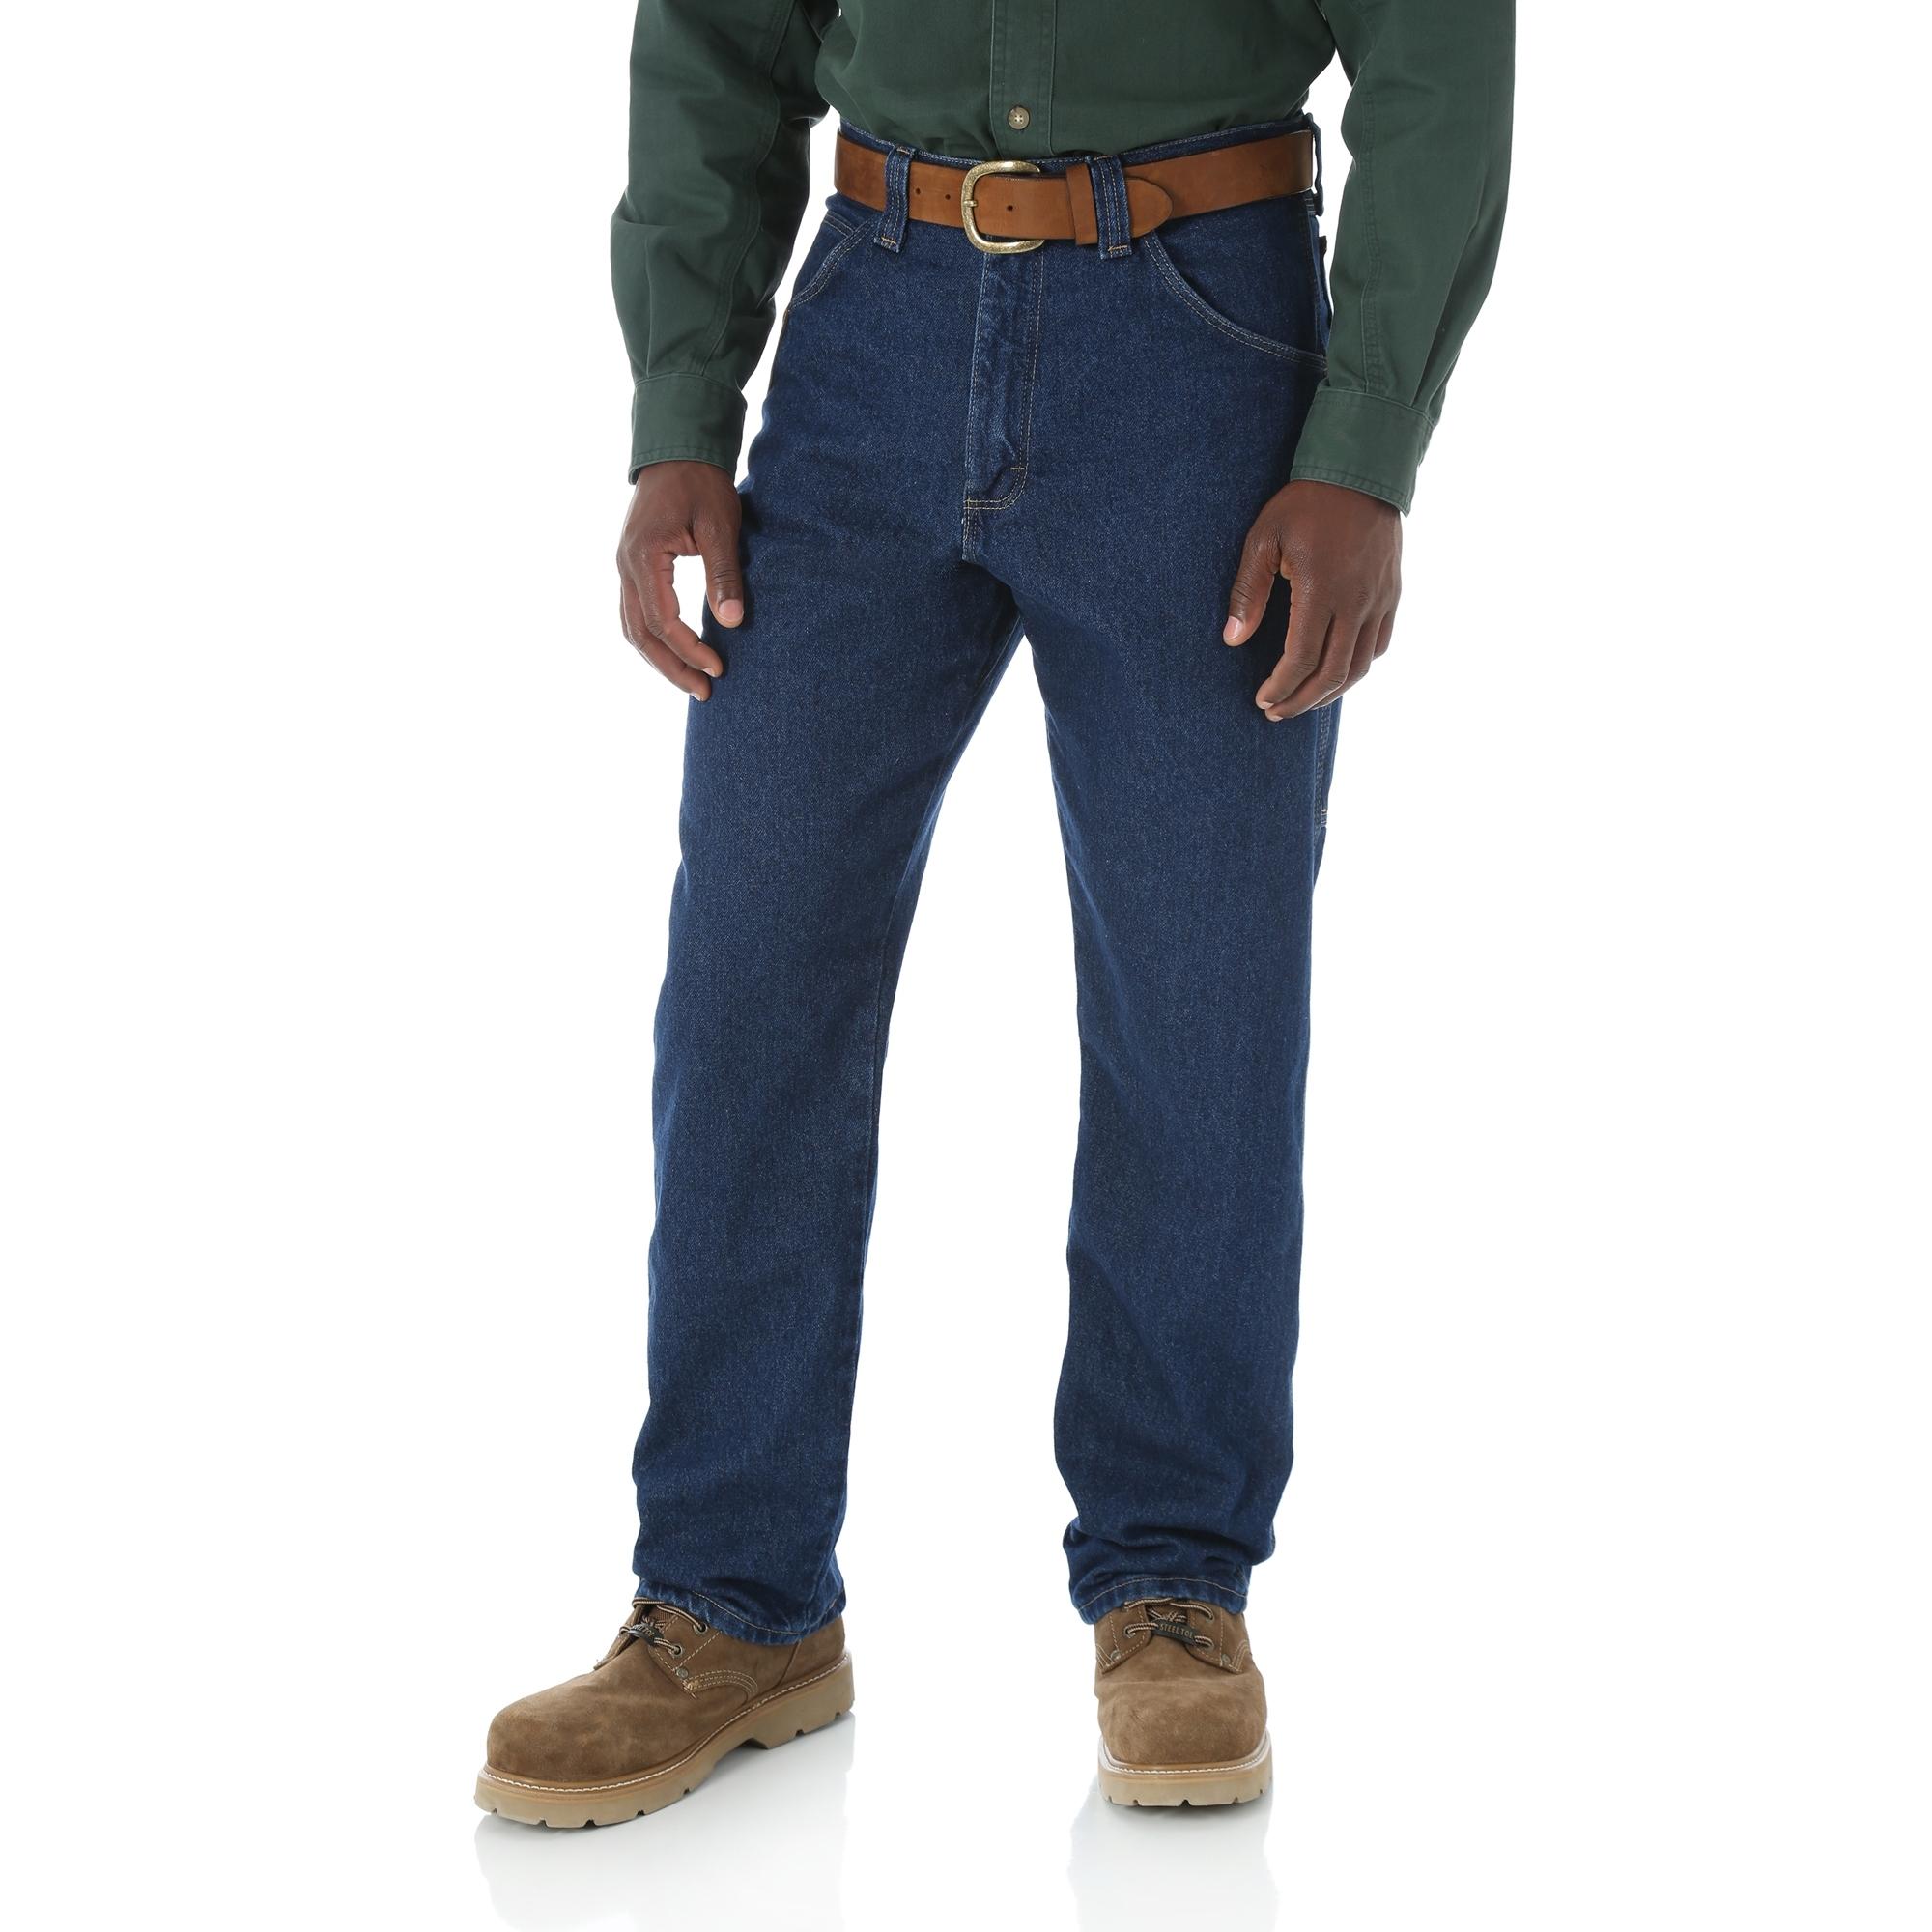 Wrangler RIGGS Carpenter Jean - Antique Indigo